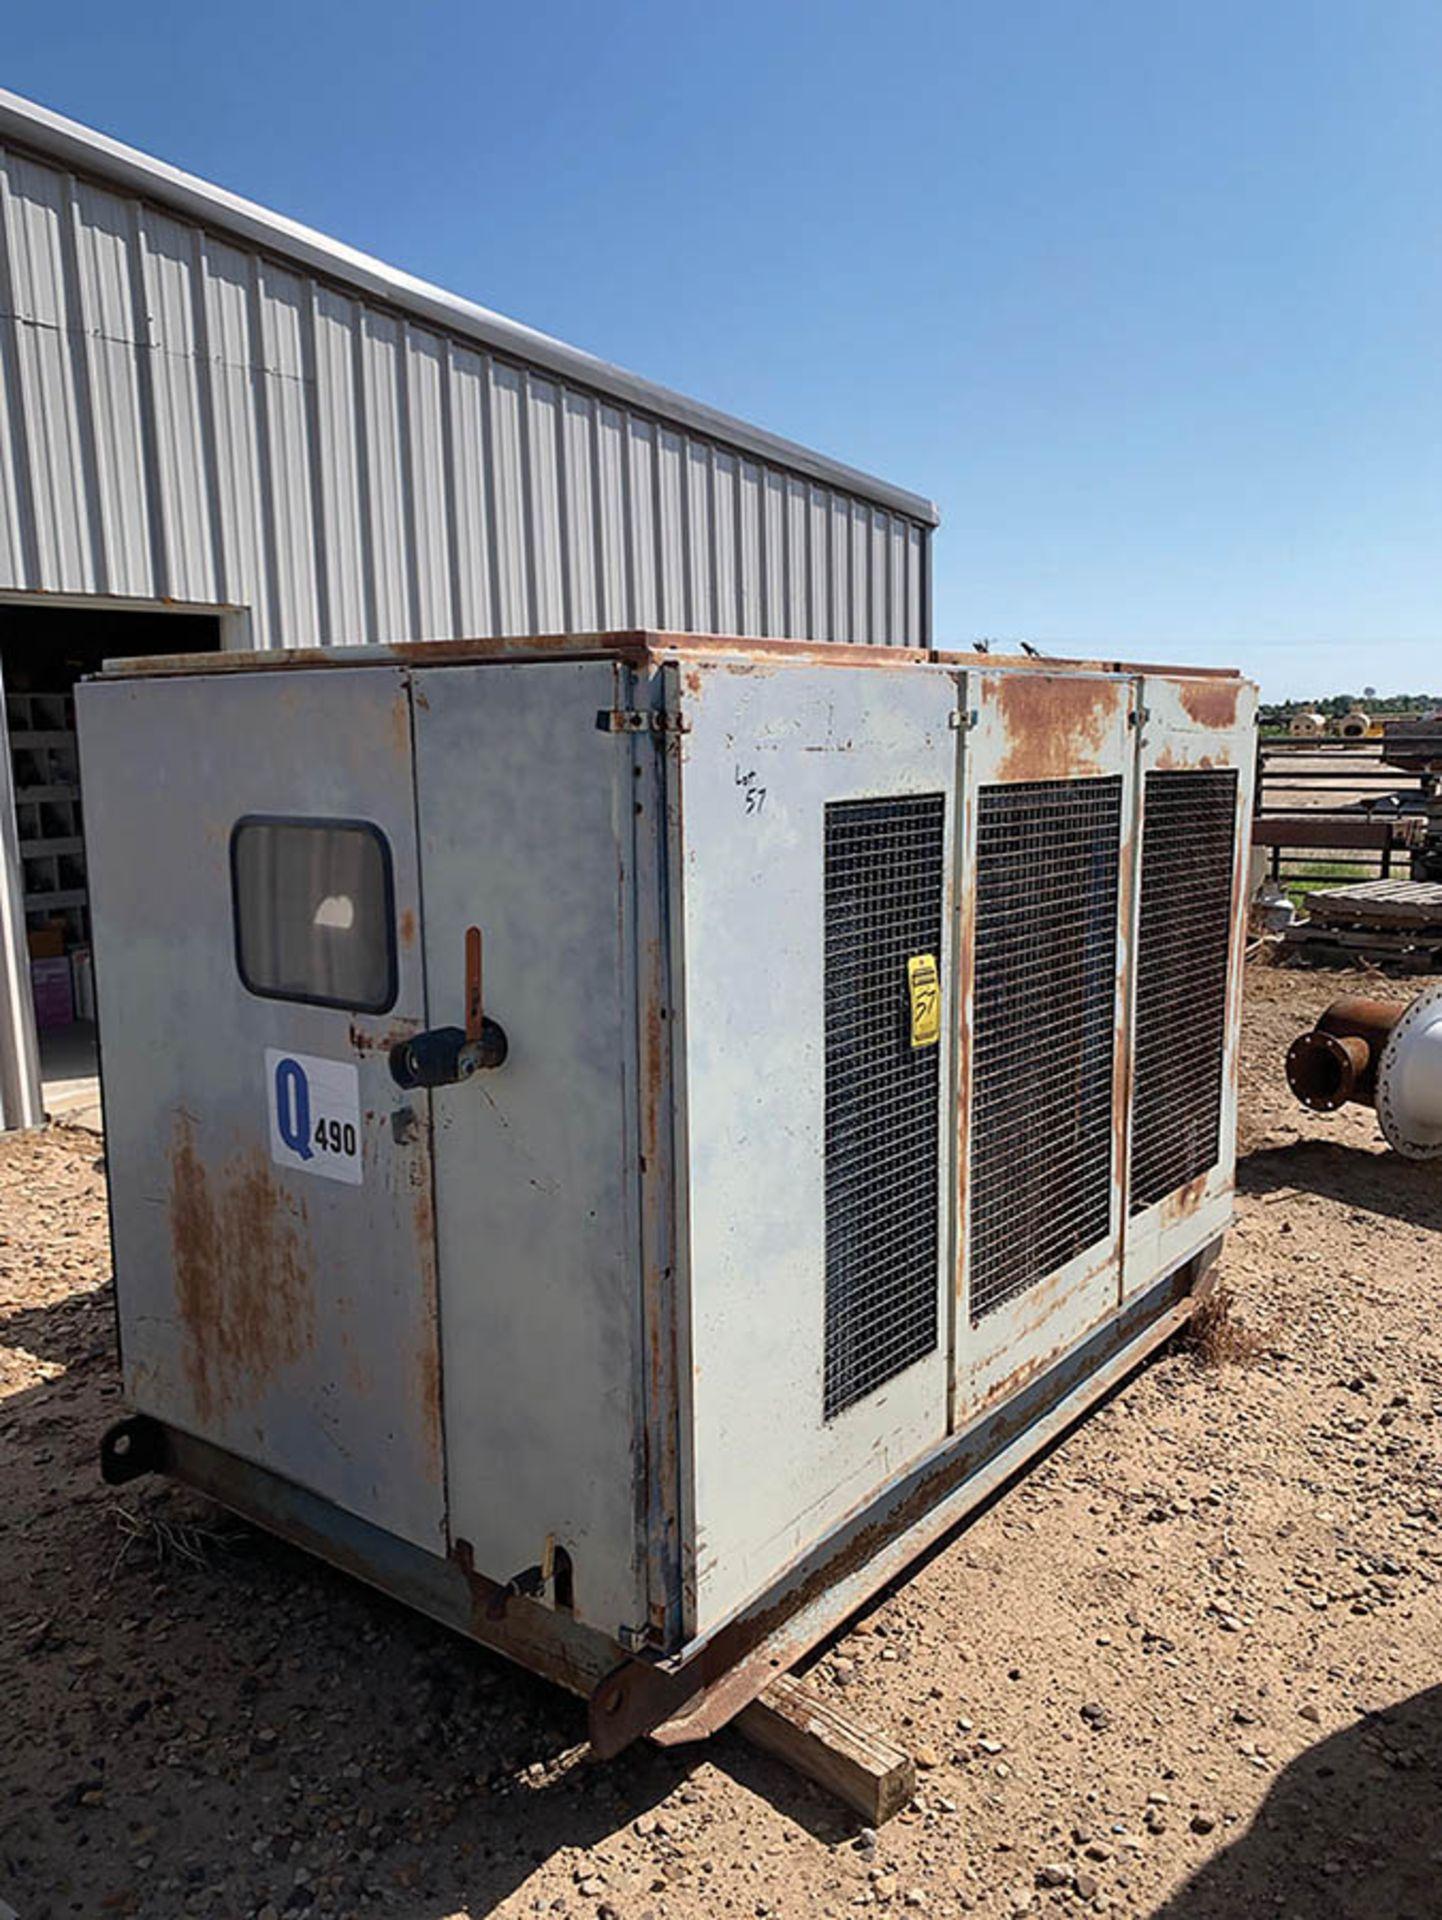 QUINCY, MODEL Q490, PORTABLE 100 HP, DIESEL POWERED AIR COMPRESSOR